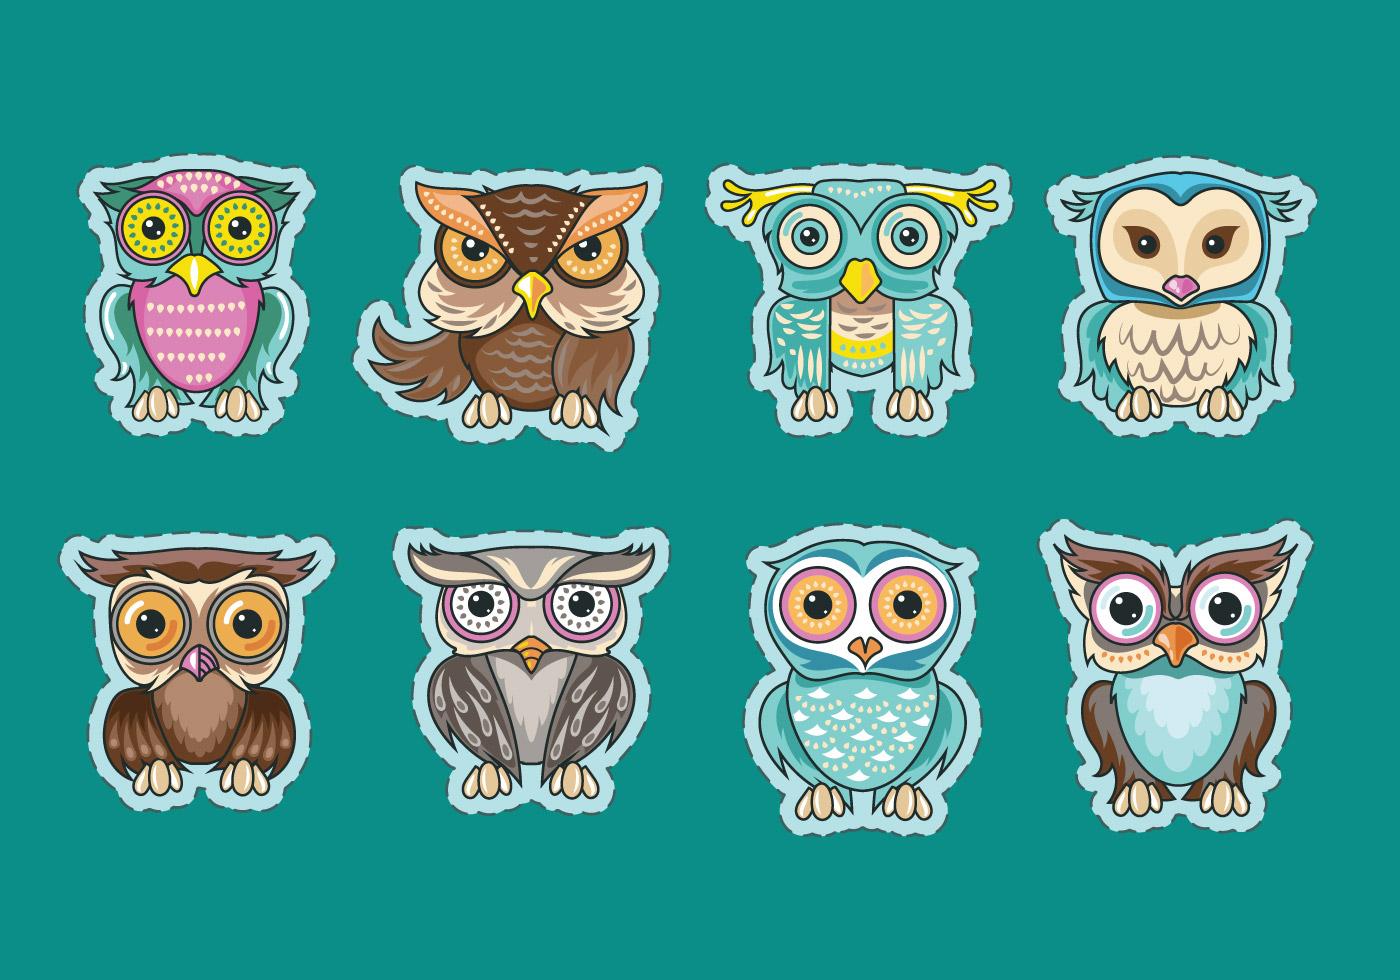 Cute Wedding Cartoon Wallpaper Set Of Cute Owls Or Buhos Sticker Vectors Download Free